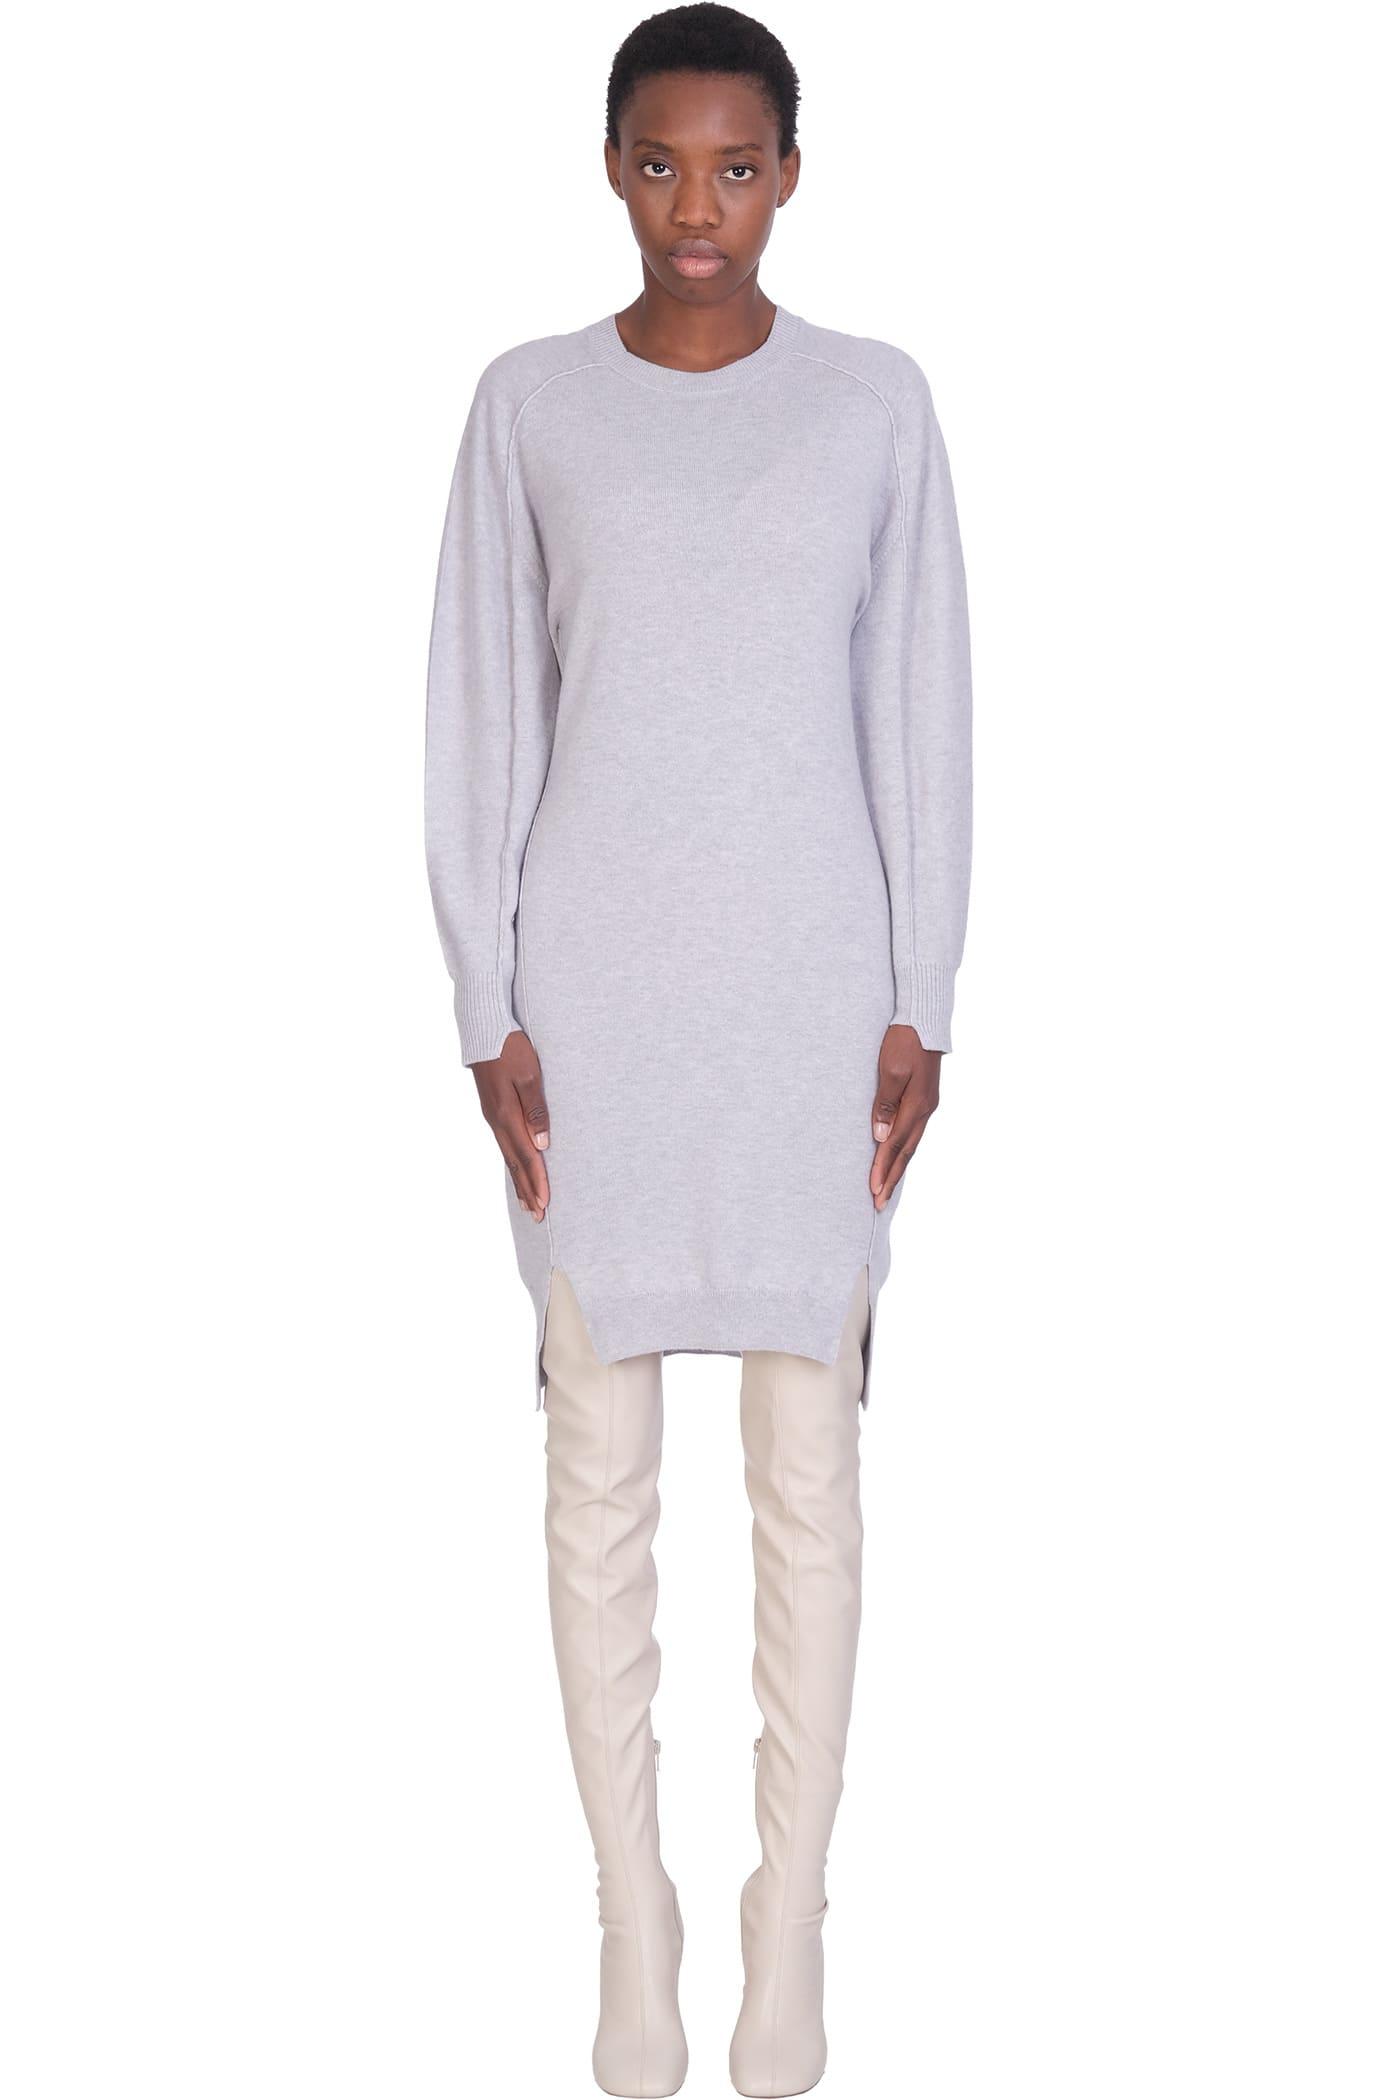 Buy Stella McCartney Dress In Grey Wool online, shop Stella McCartney with free shipping